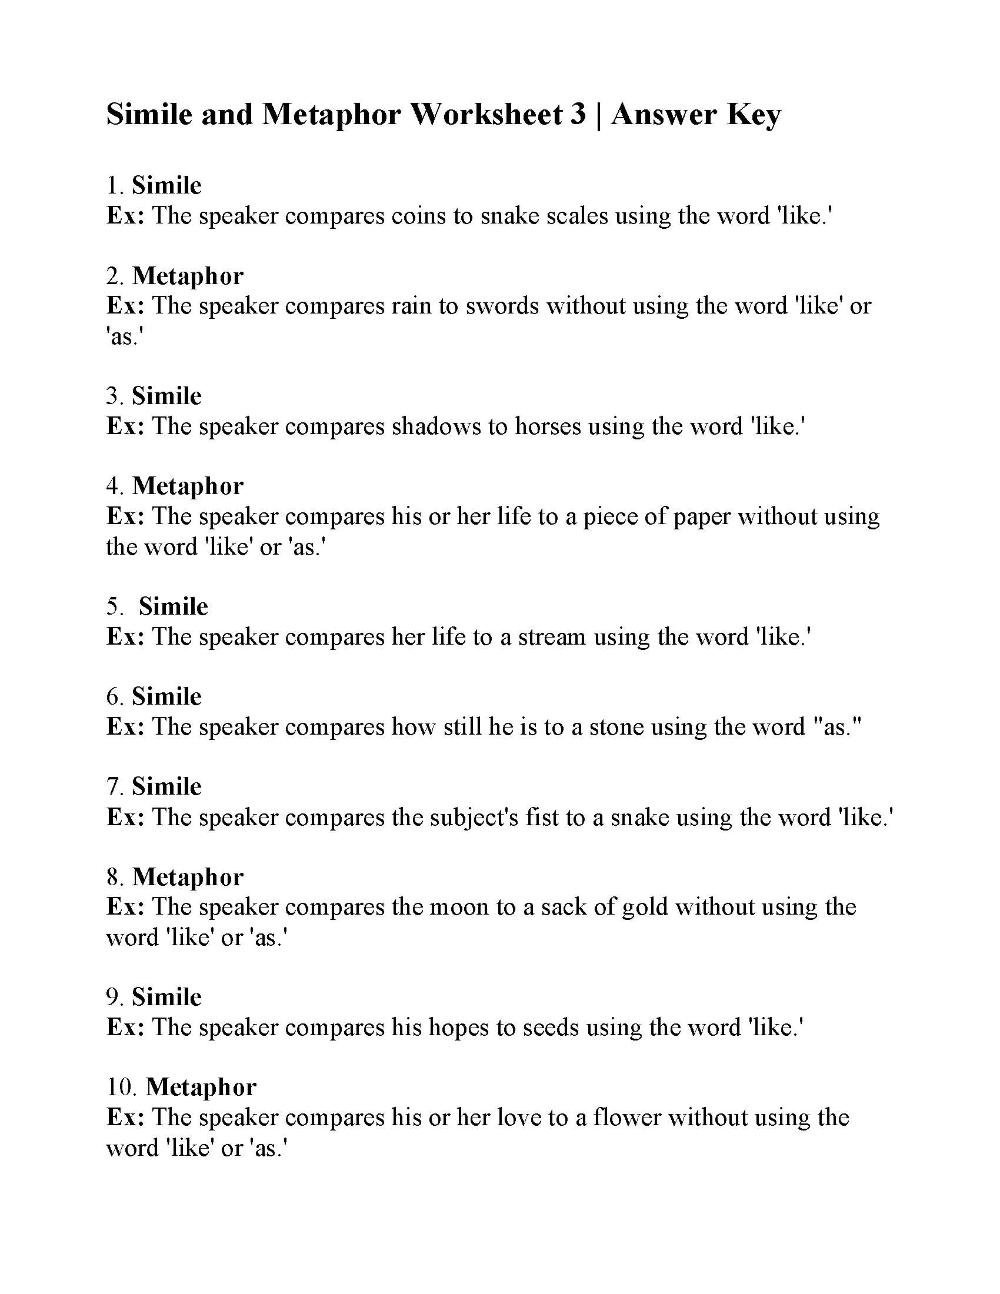 Simile And Metaphor Worksheet 3 Answers Similes And Metaphors Figurative Language Worksheet Language Worksheets [ 1294 x 1000 Pixel ]